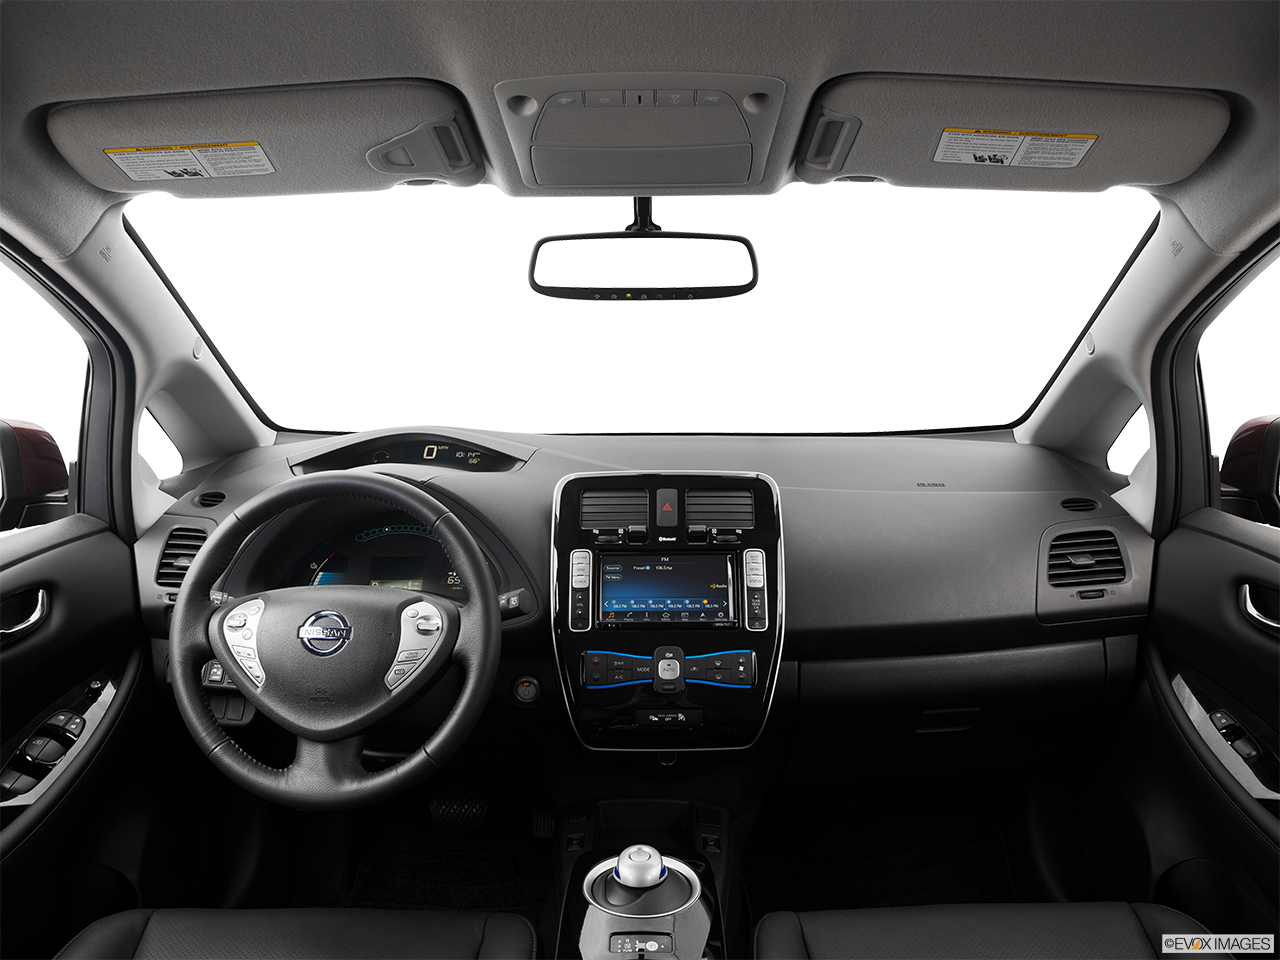 Interior View Of 2017 Nissan Pathfinder Coachella Indio Valley